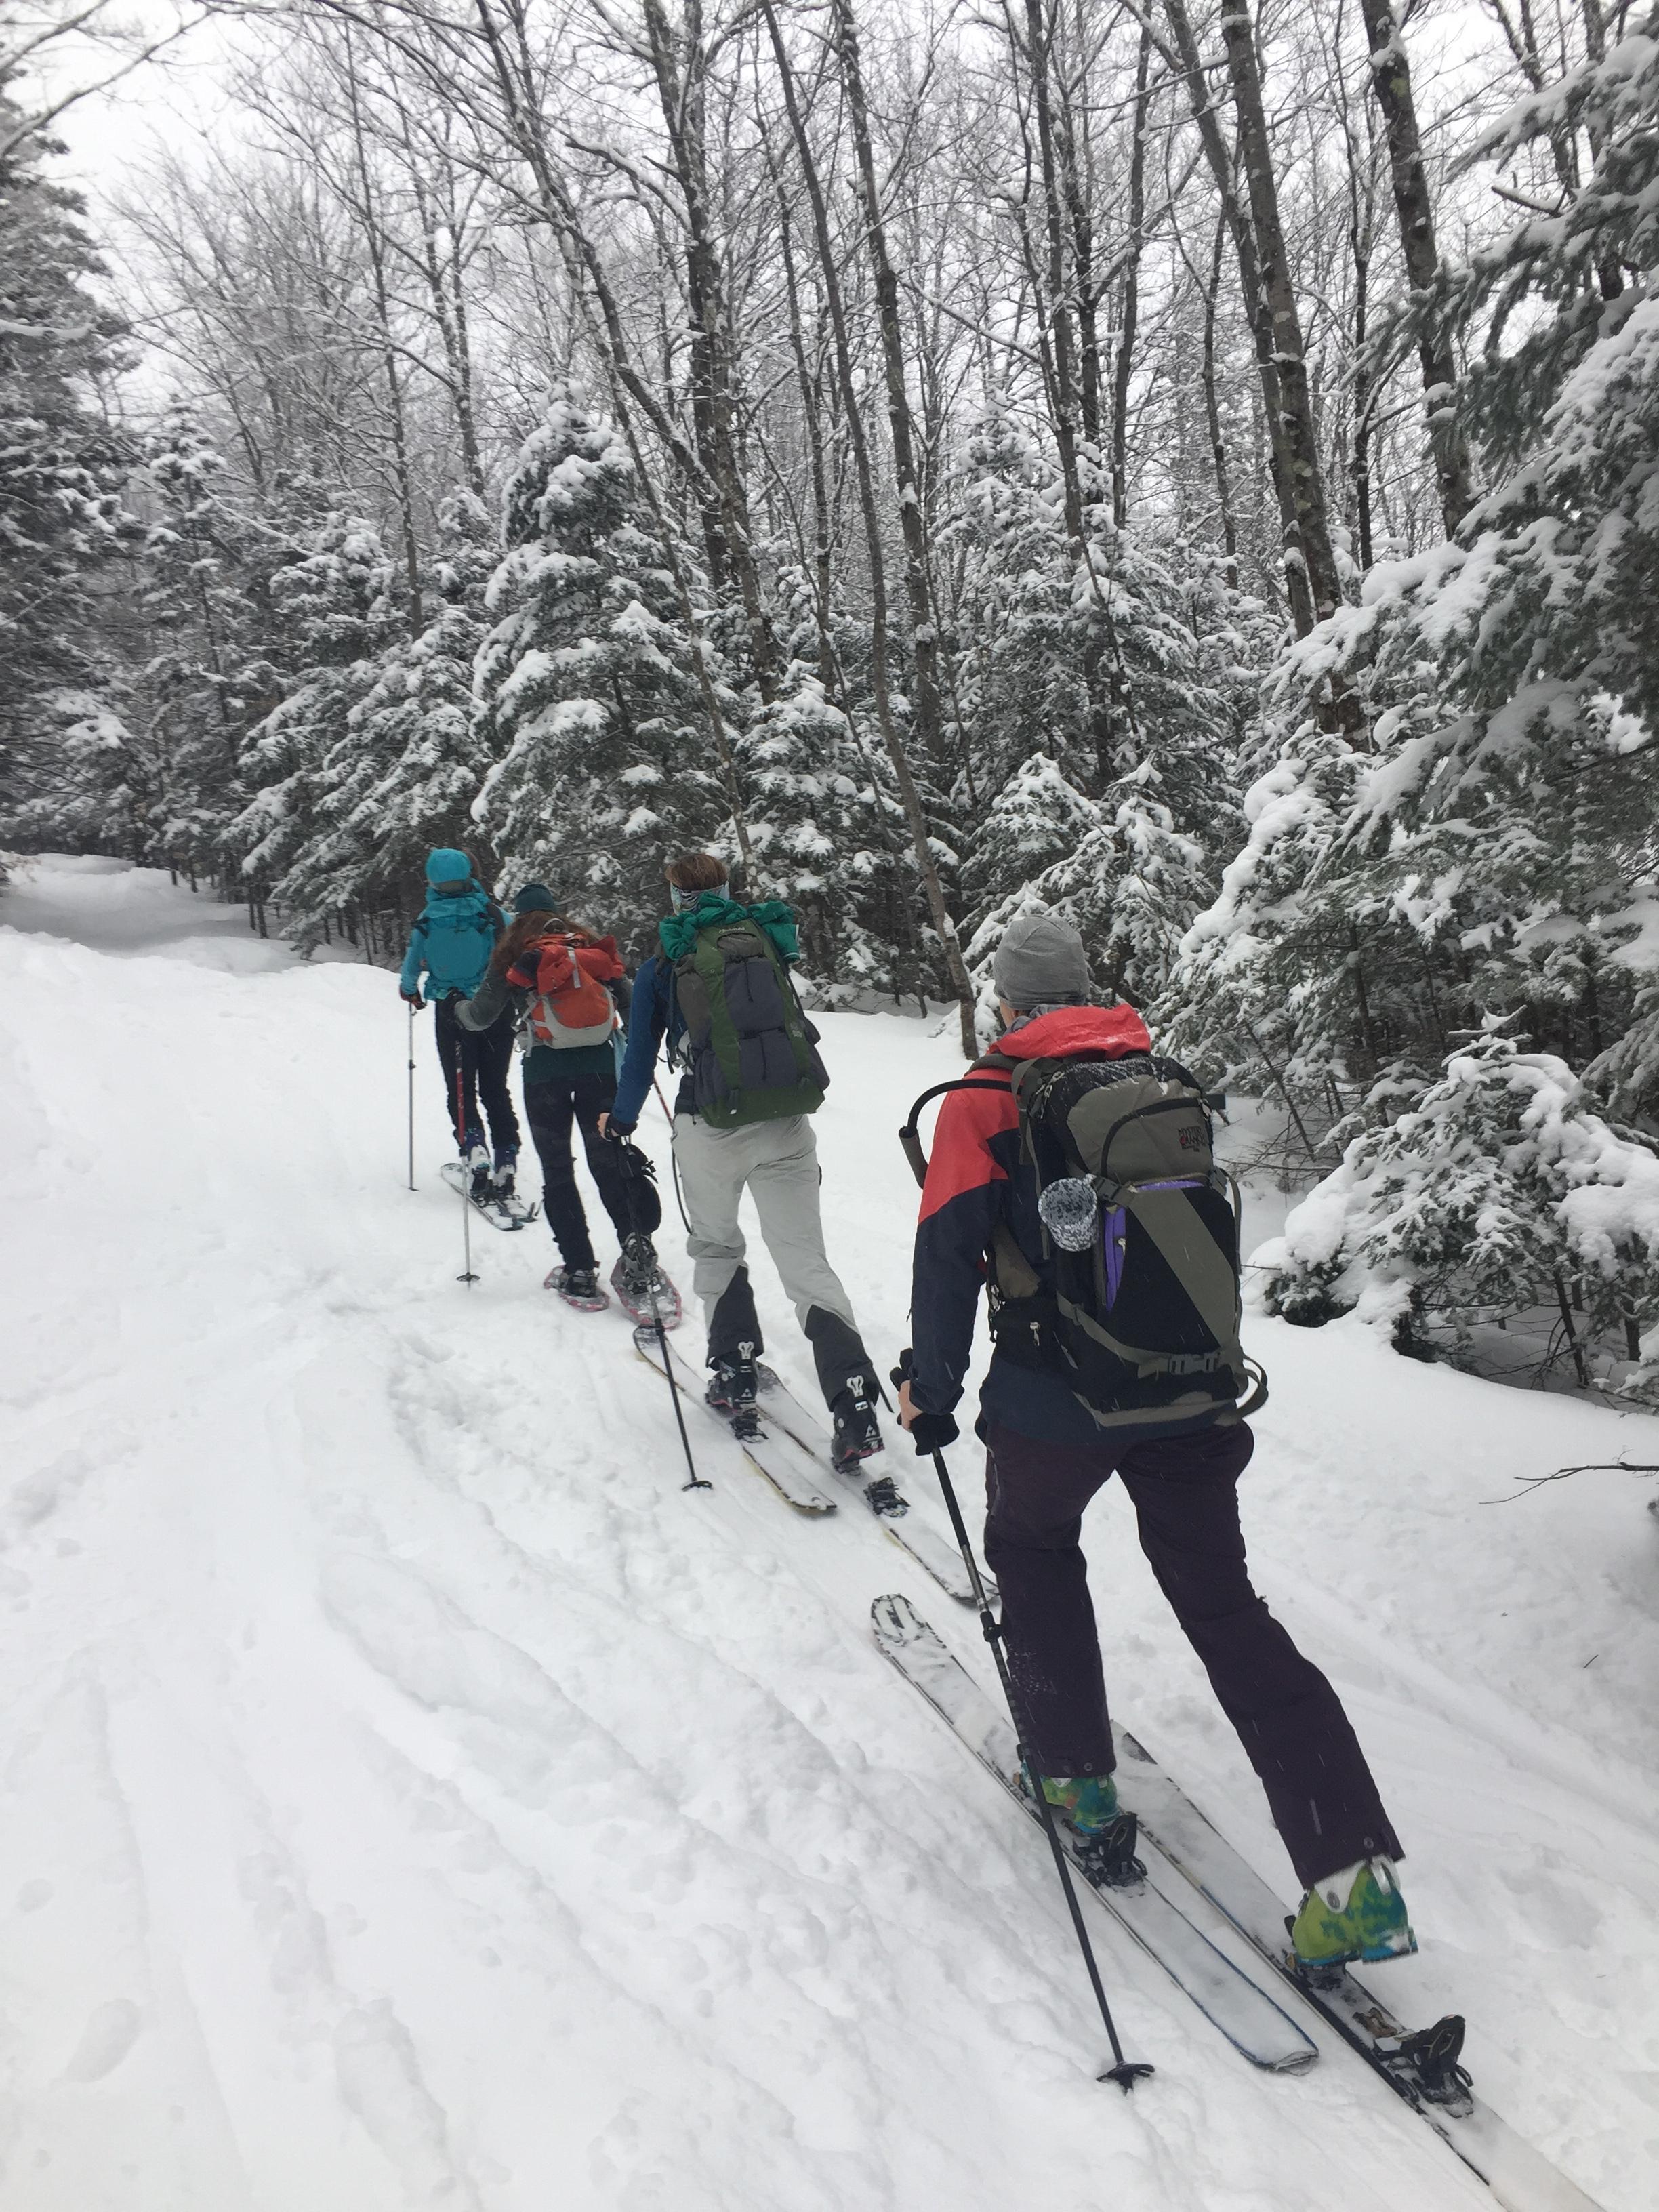 Group skin up Black Mountain Trail in Jackson, NH. Feb. Retreat 2017